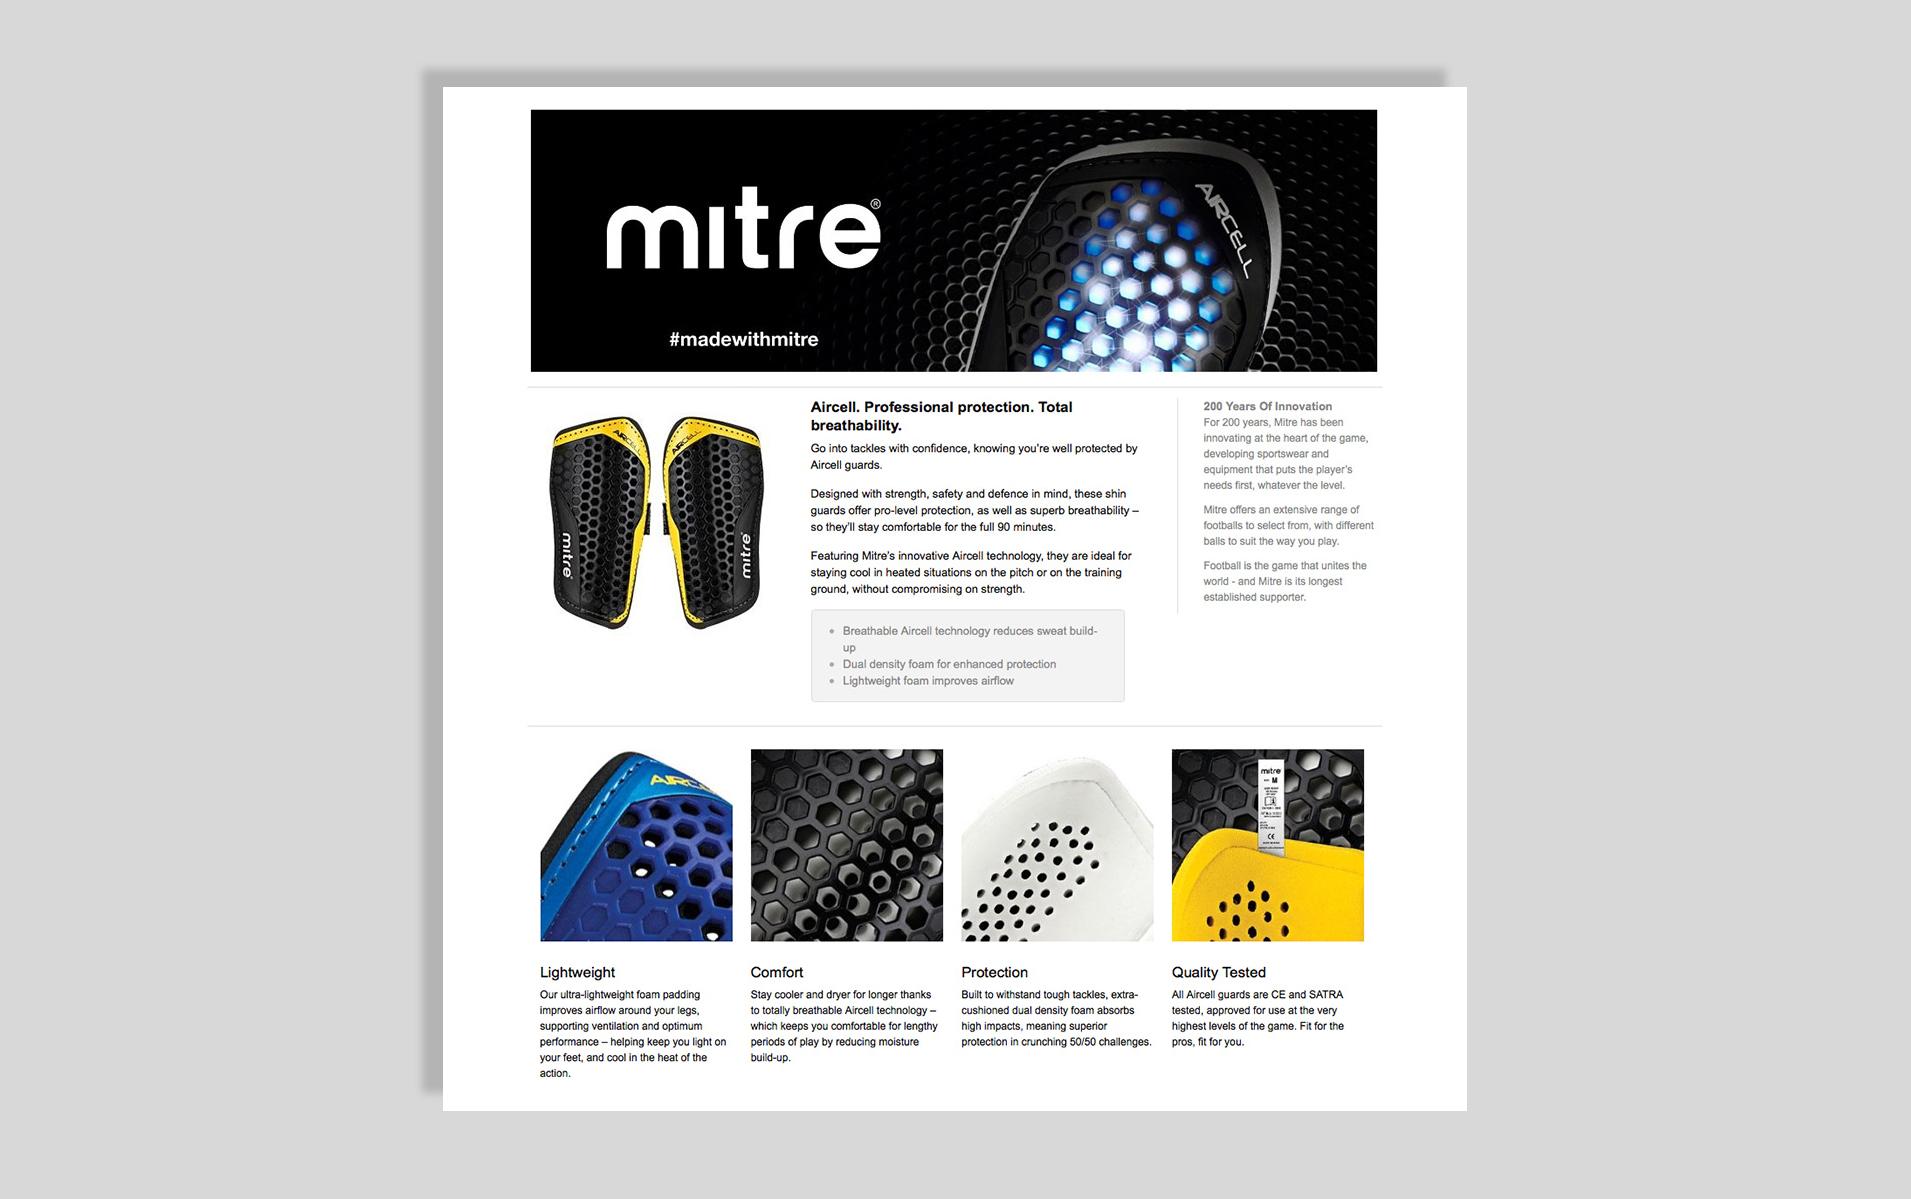 mitre_3_new.jpg